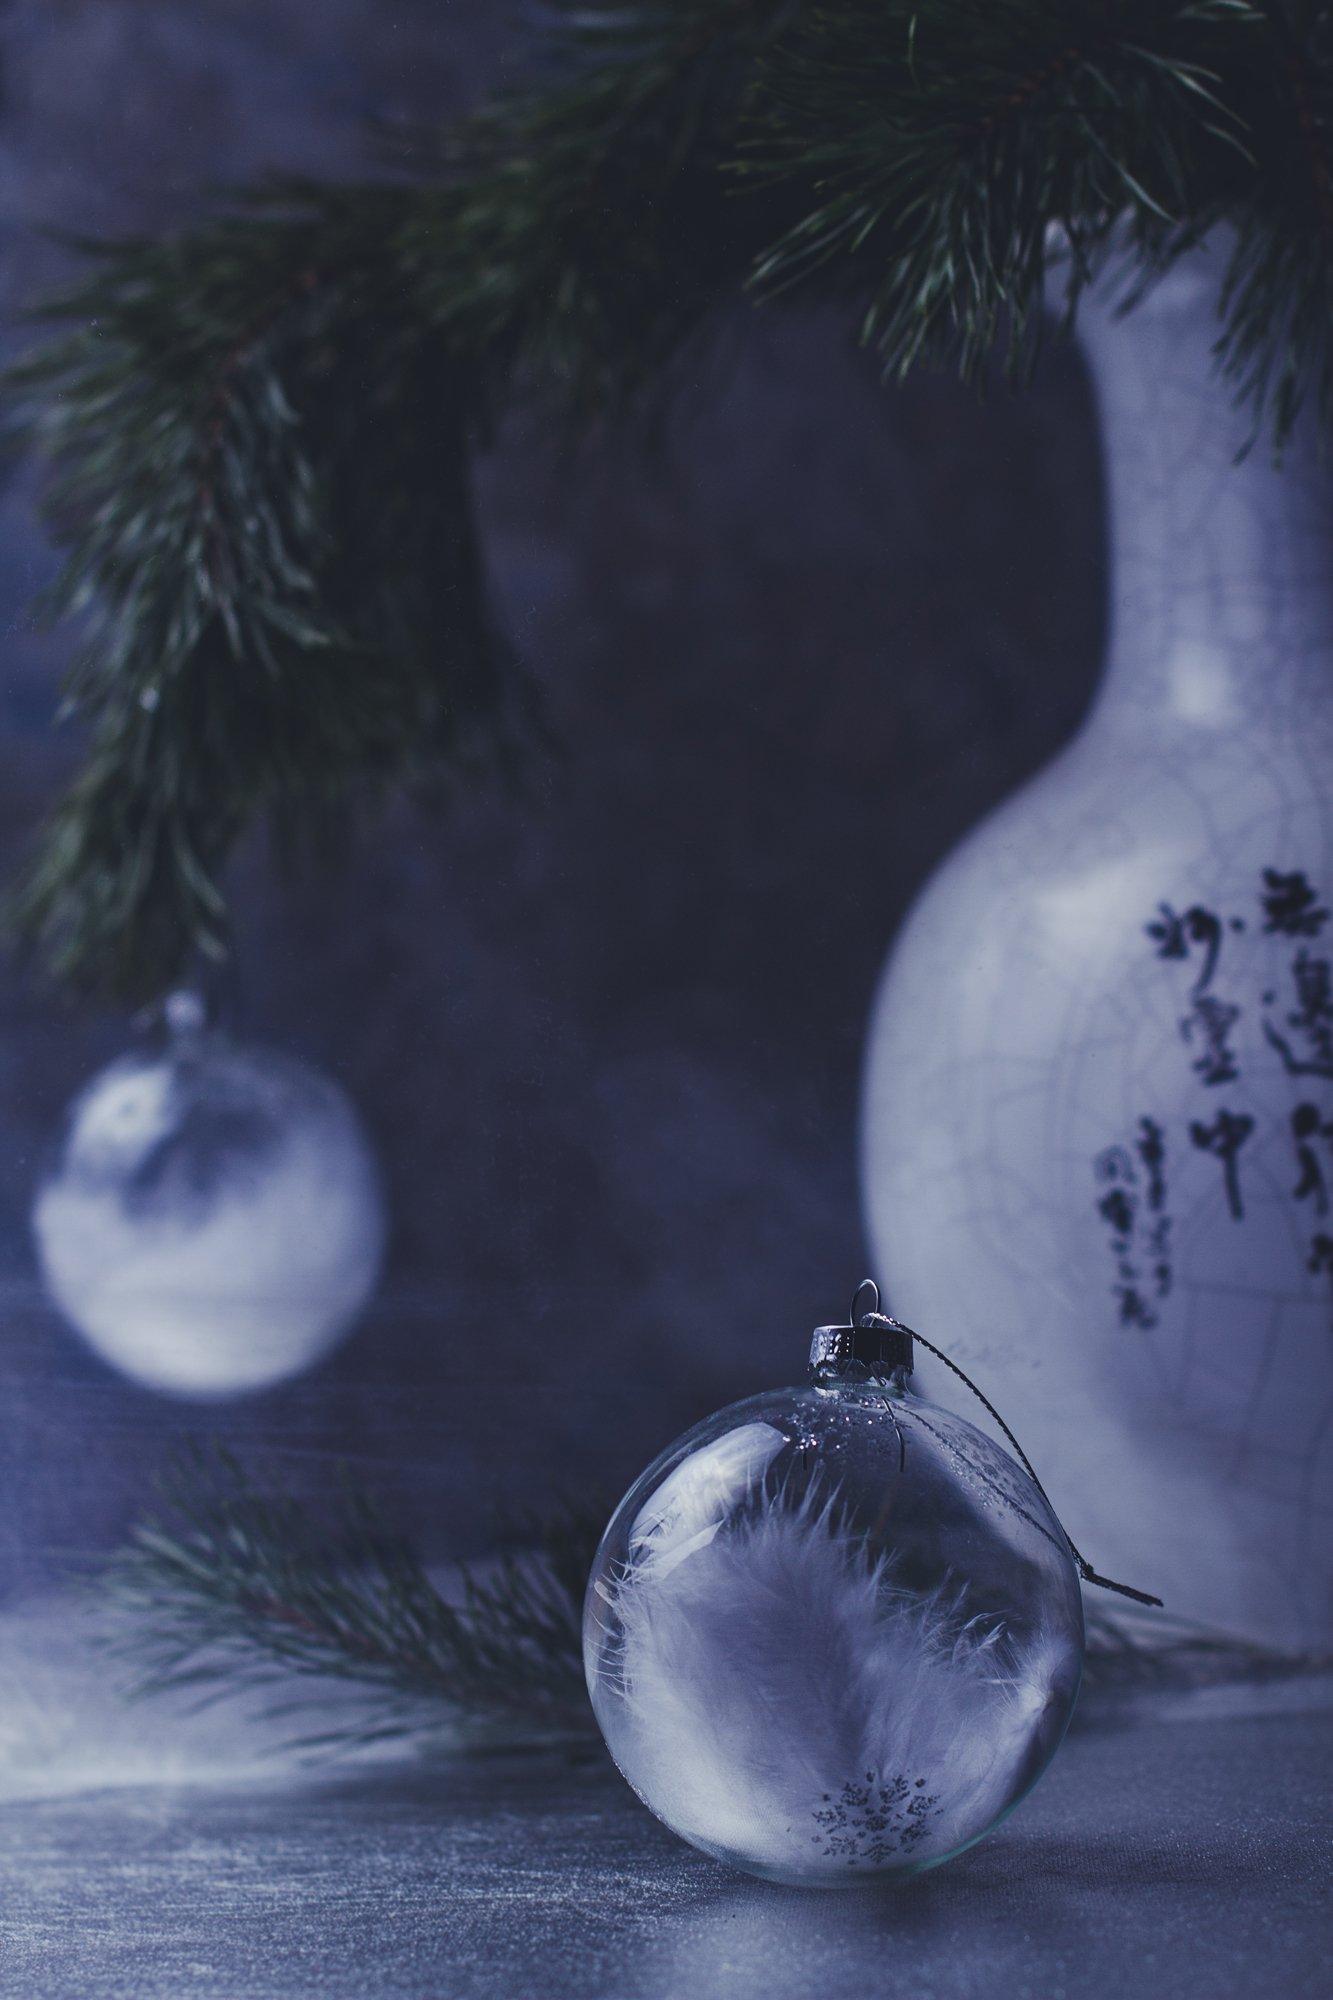 натюрморт, зима, шар, сосна, новый год, Наталья Голубева